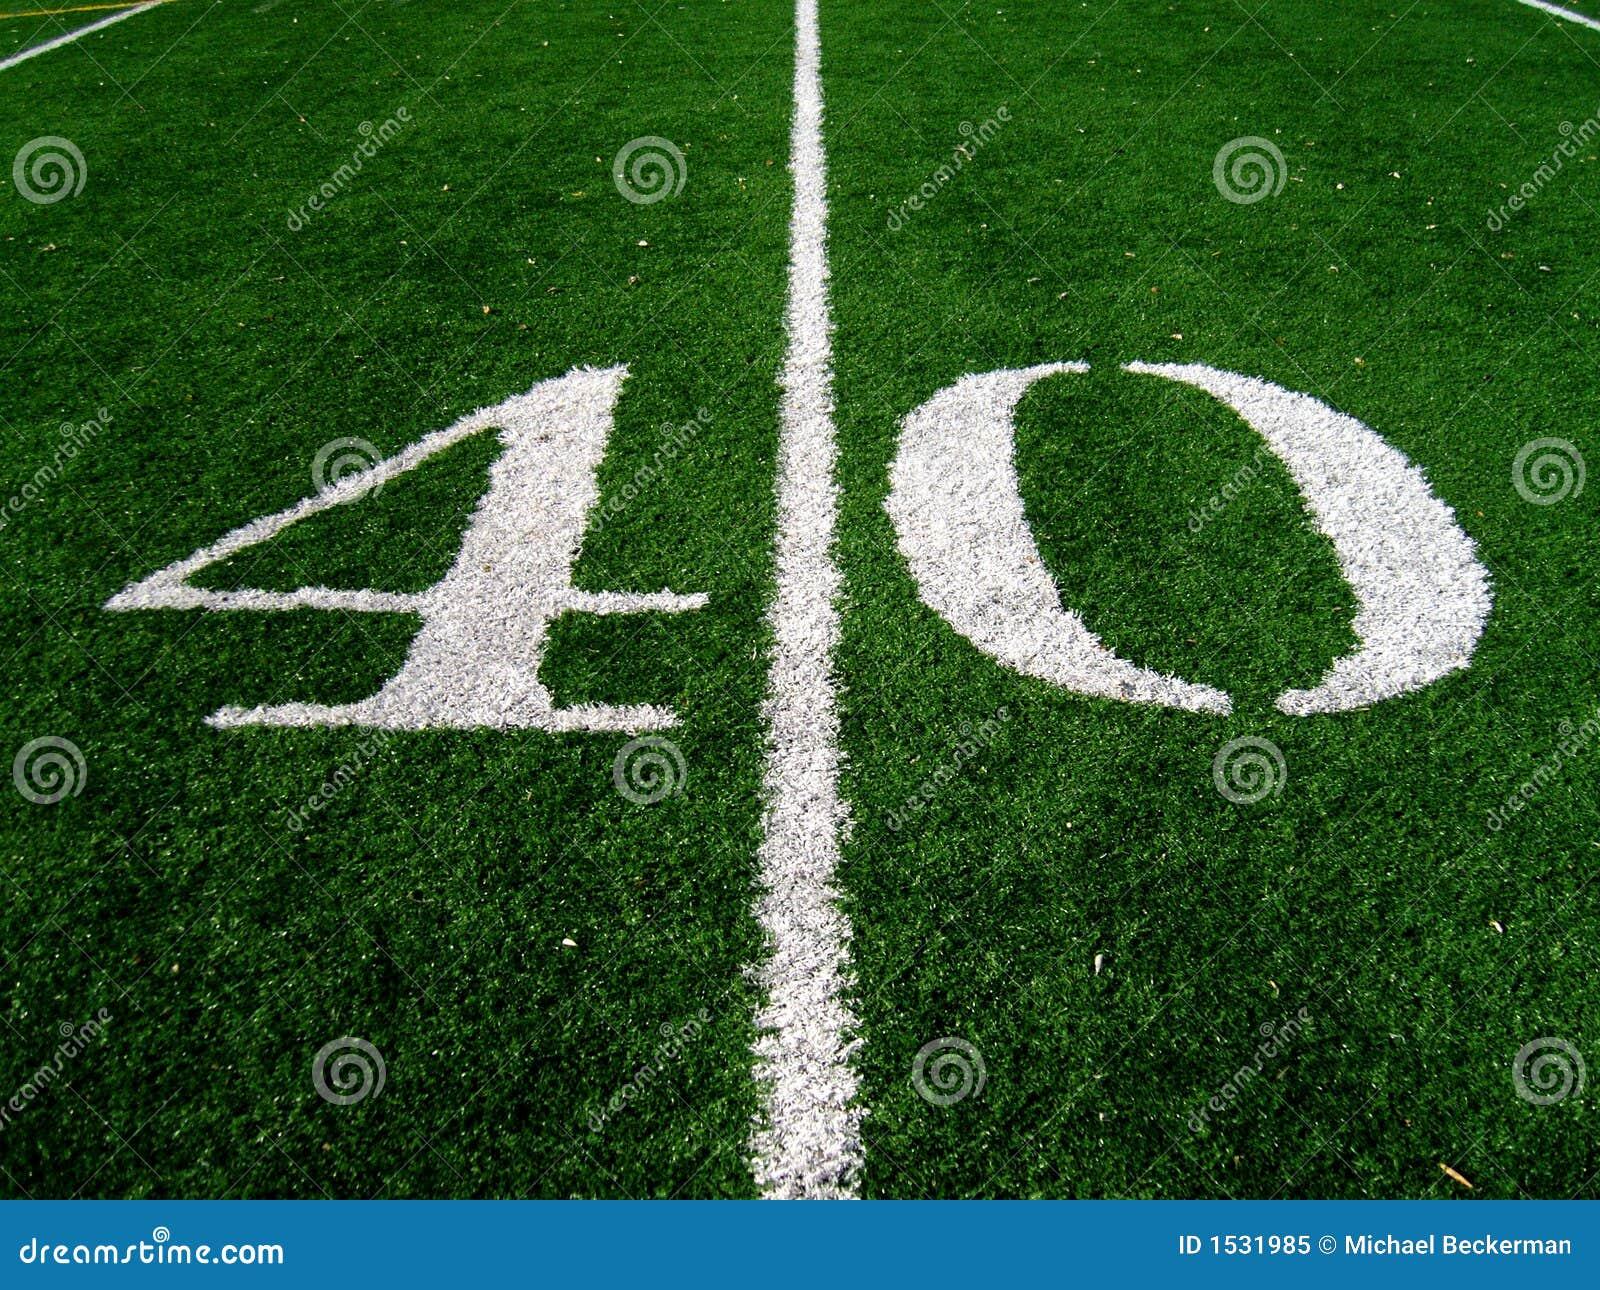 40 yard line royalty free stock photo image 1531985